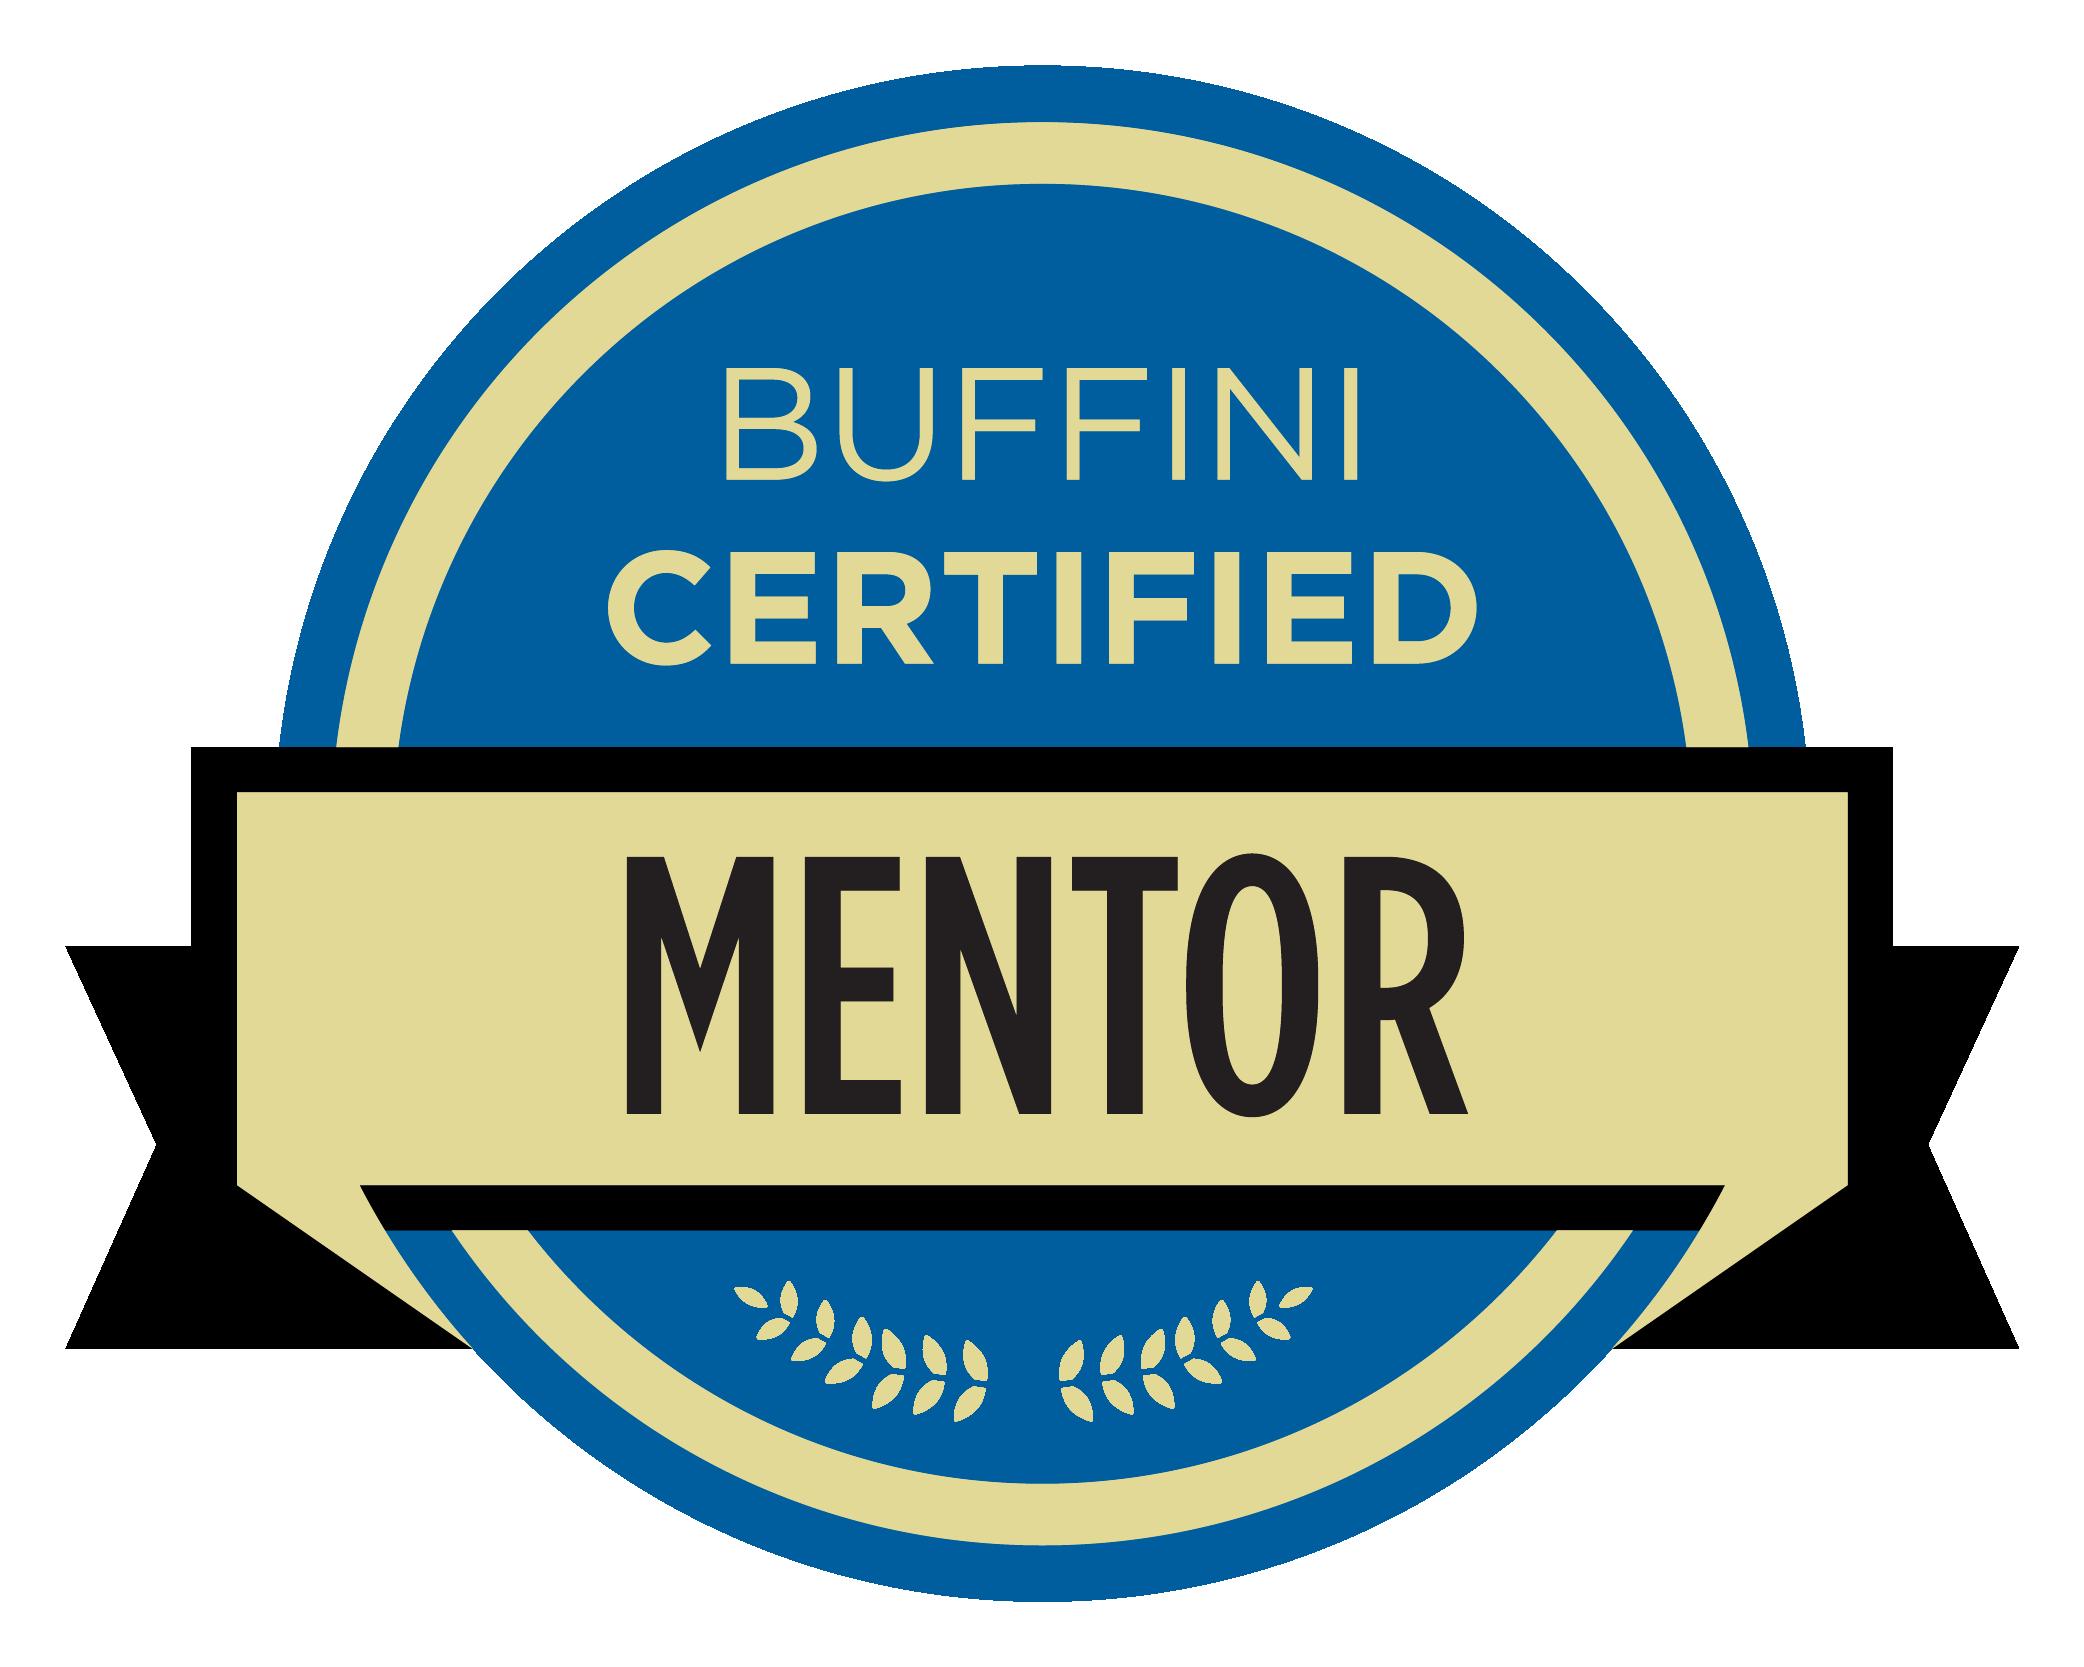 Buffini Certified Mentor